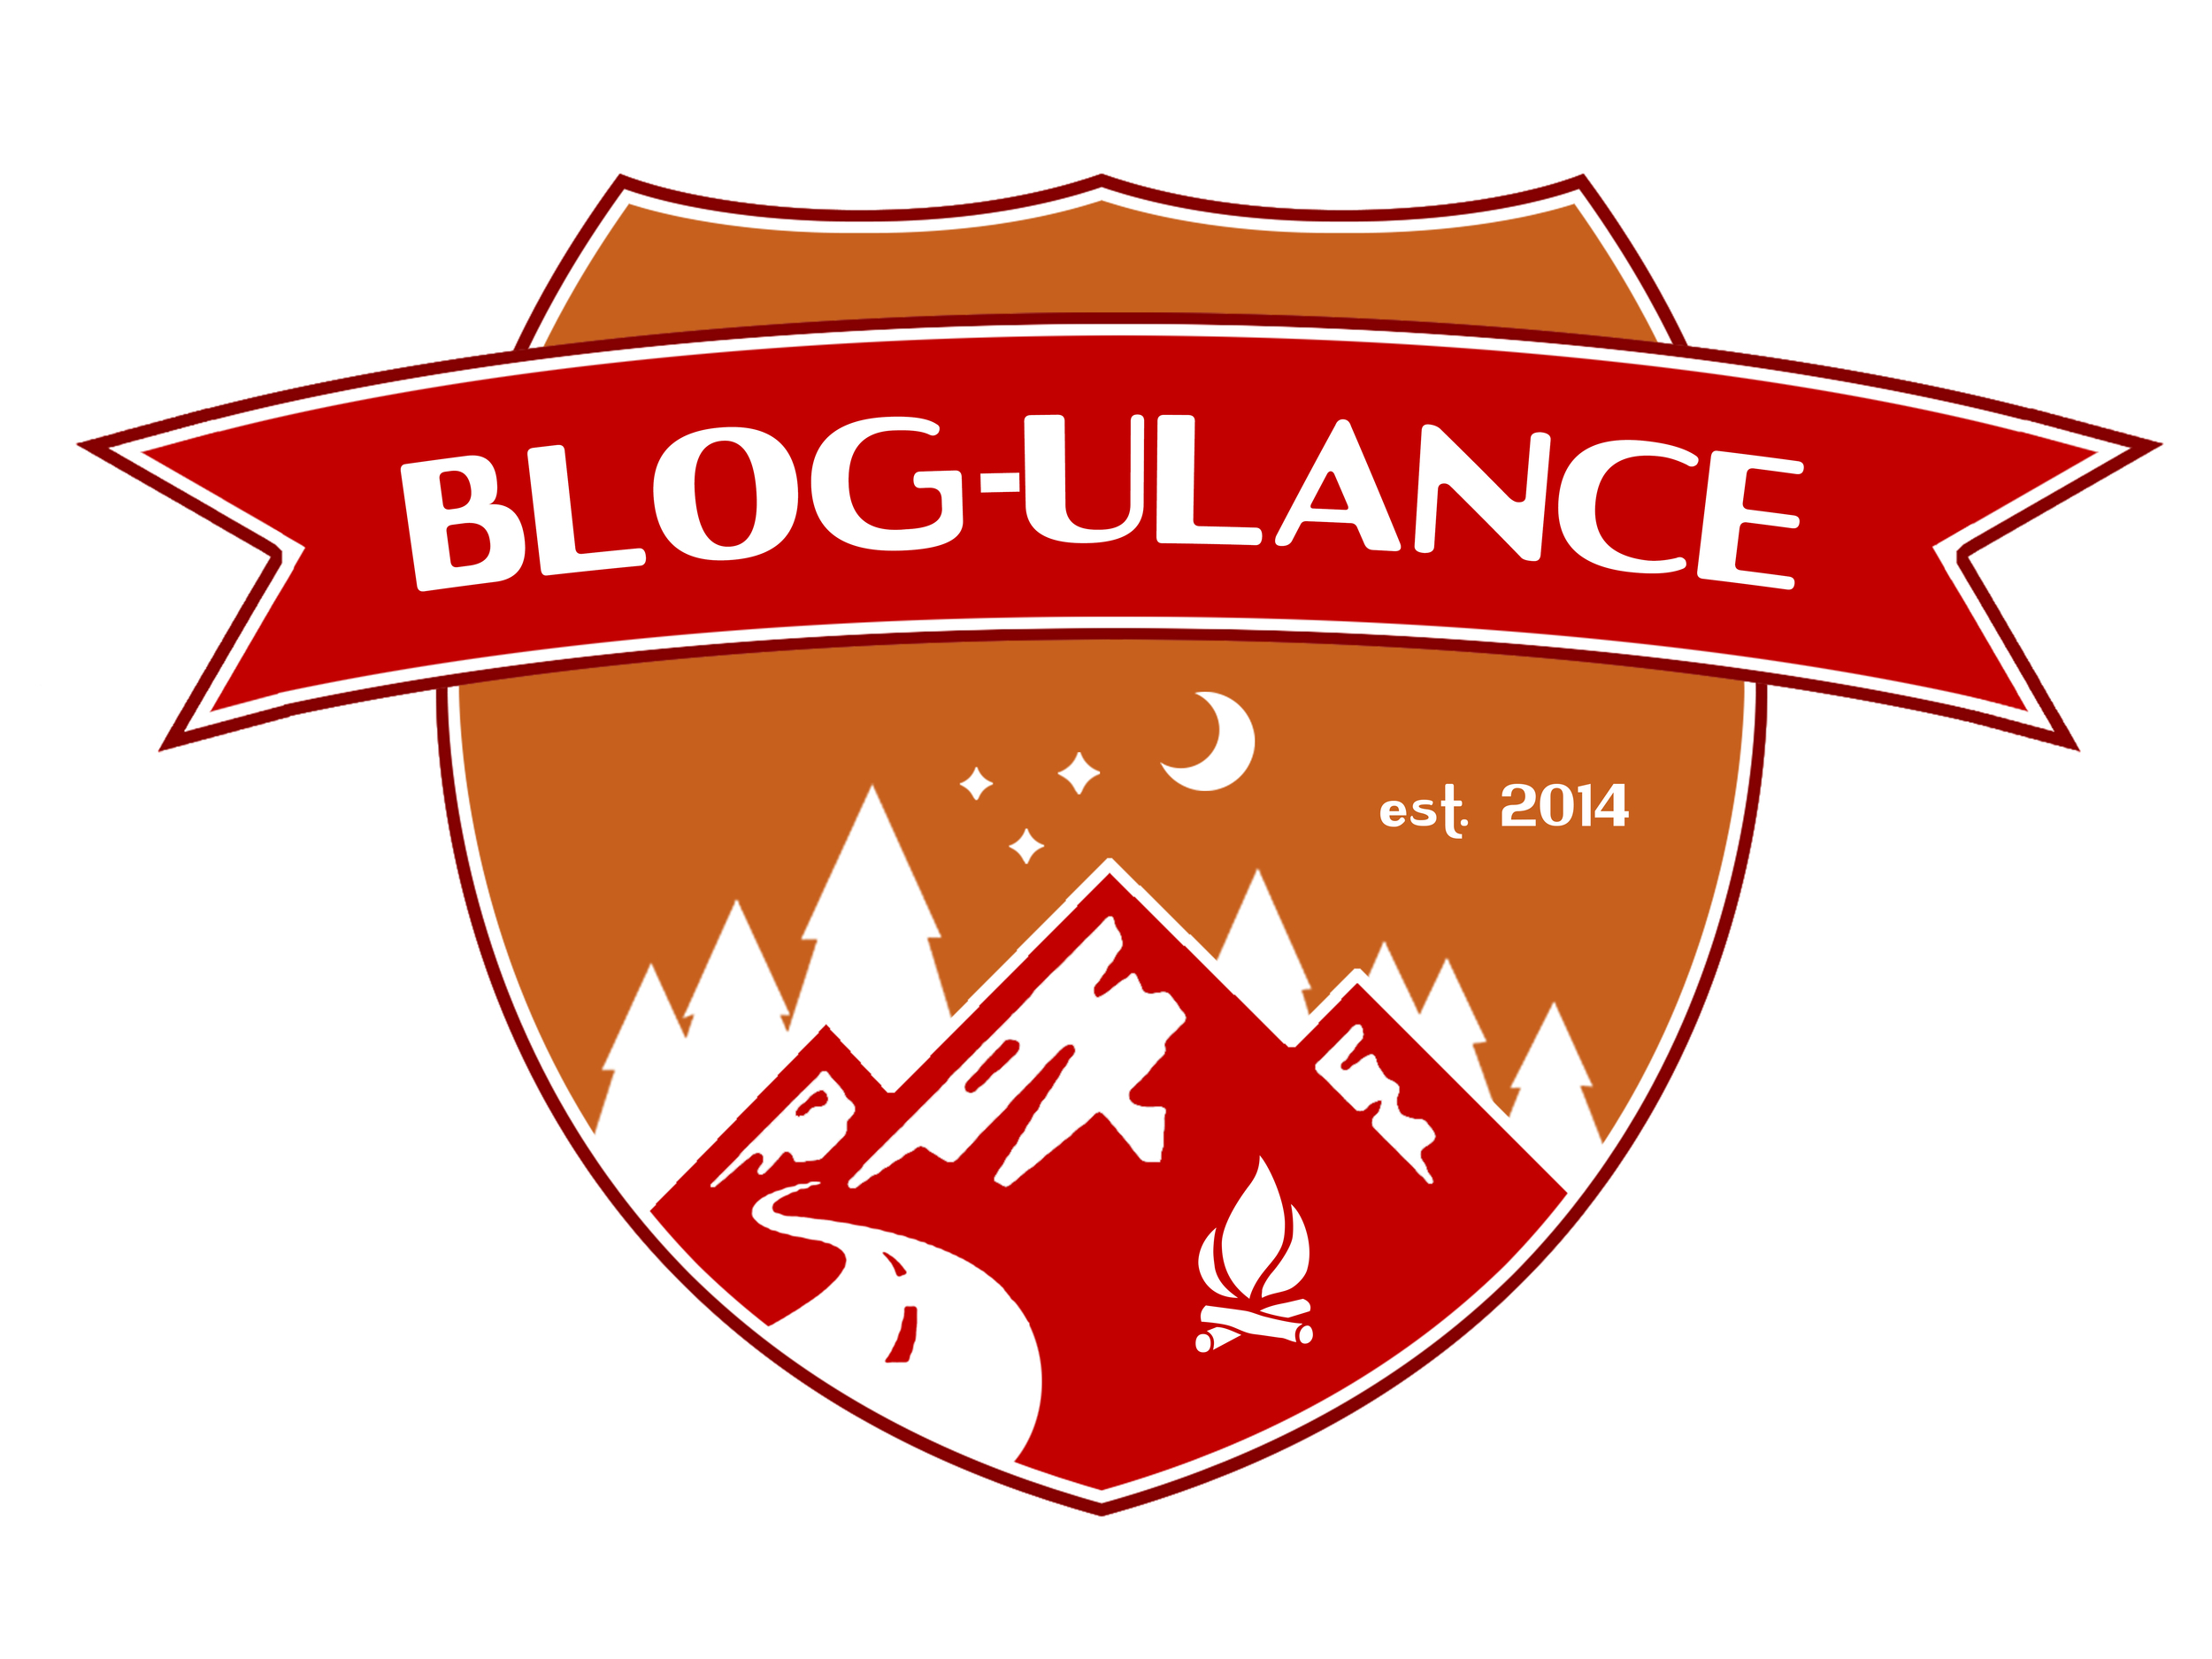 Blogulance.jpg